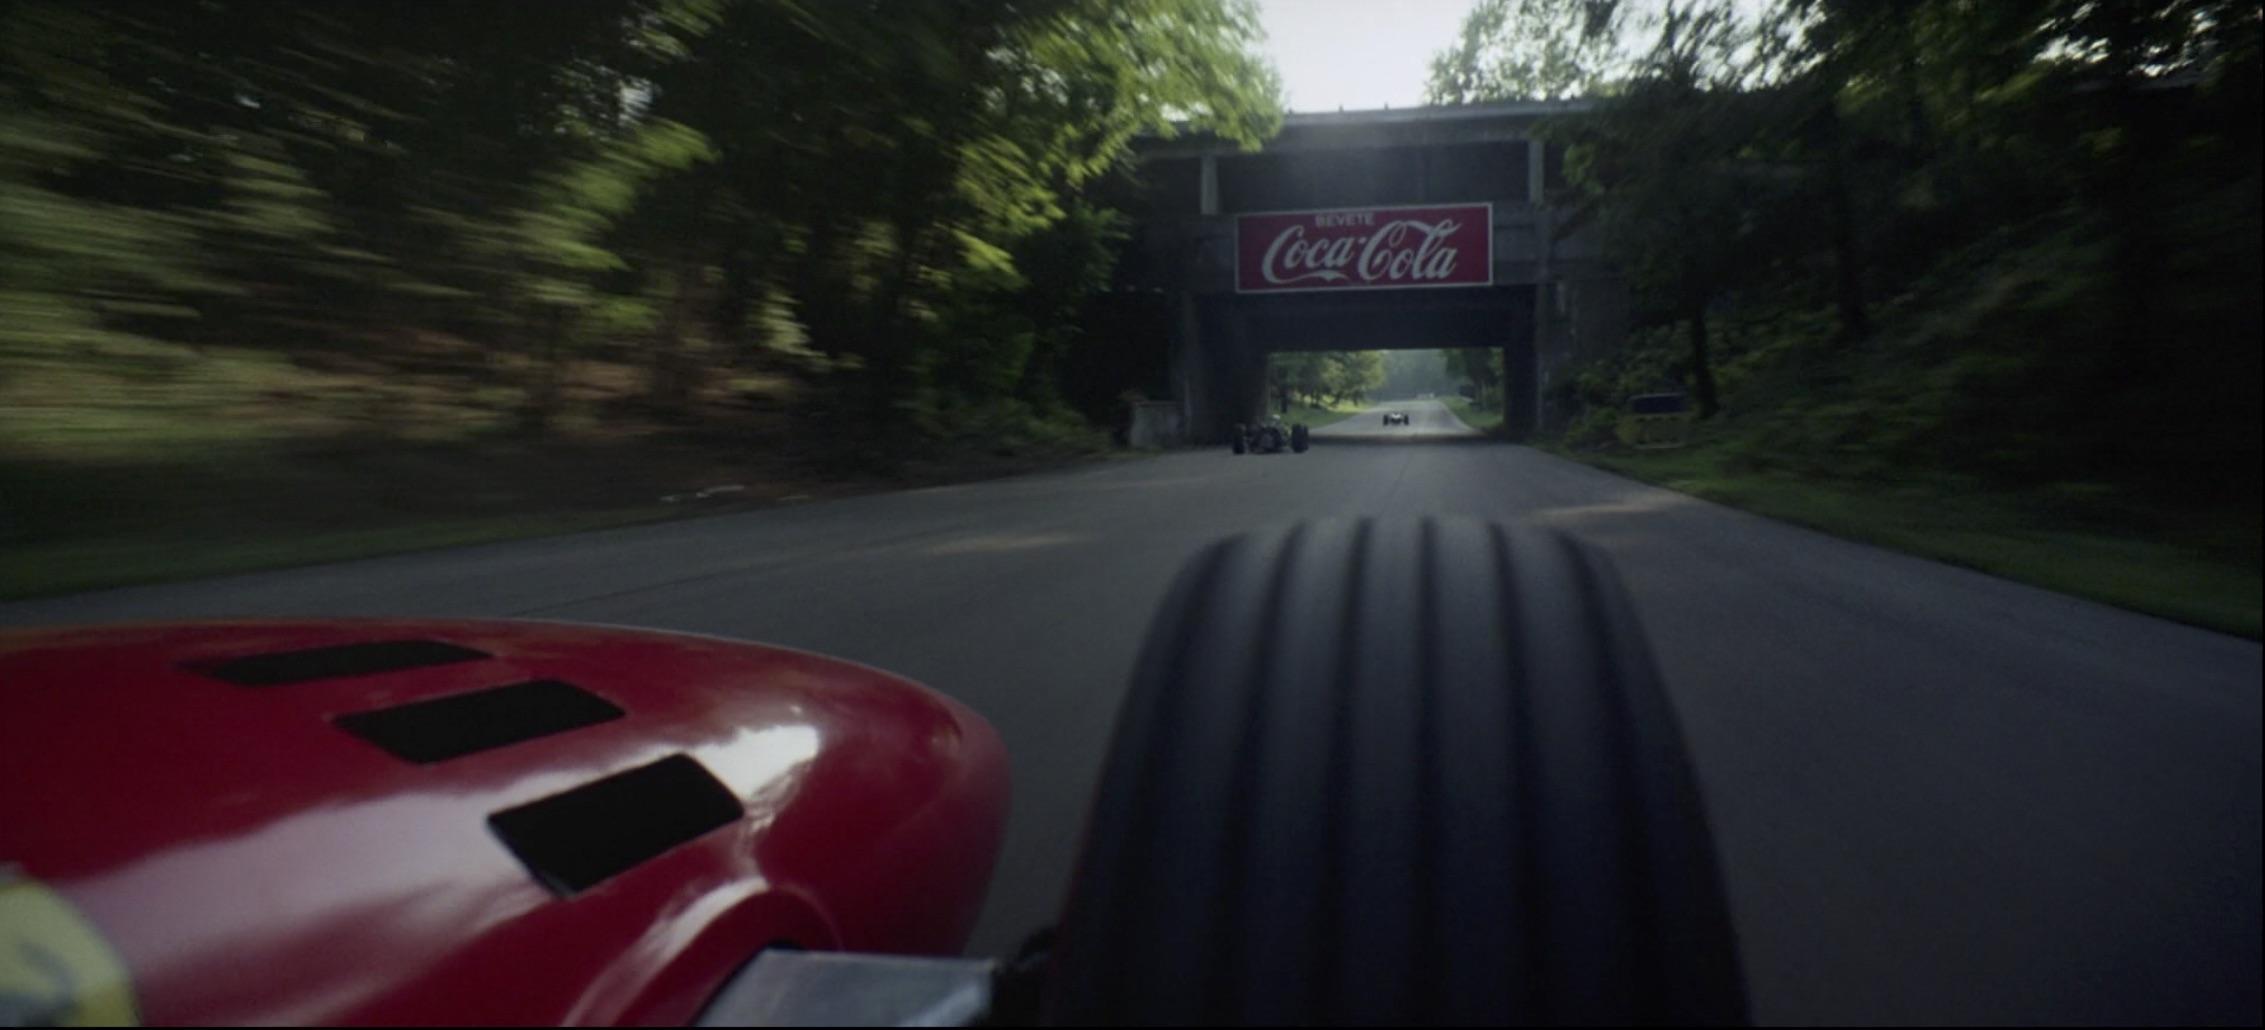 Grand Prix ferrari coca-cola race